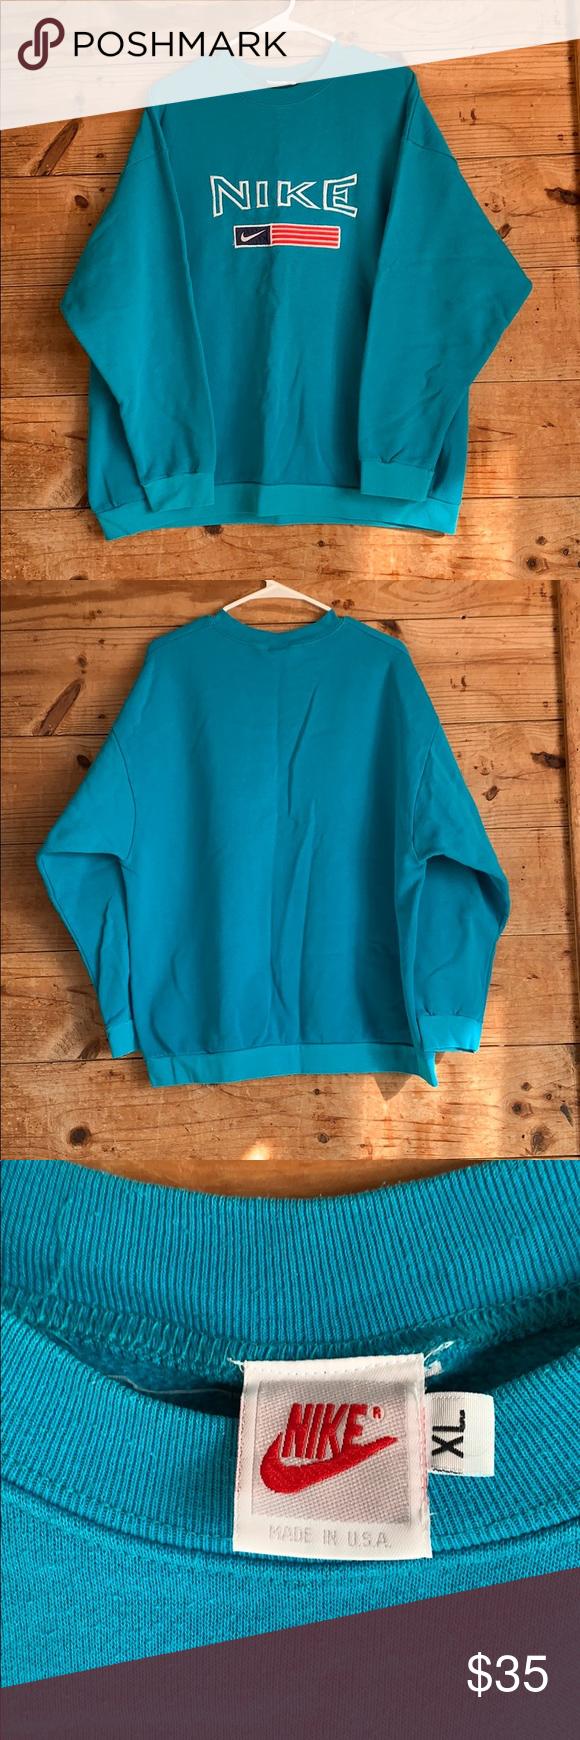 Vintage Nike Sweater Vintage Nike Sweater Nike Sweater Sweaters [ 1740 x 580 Pixel ]